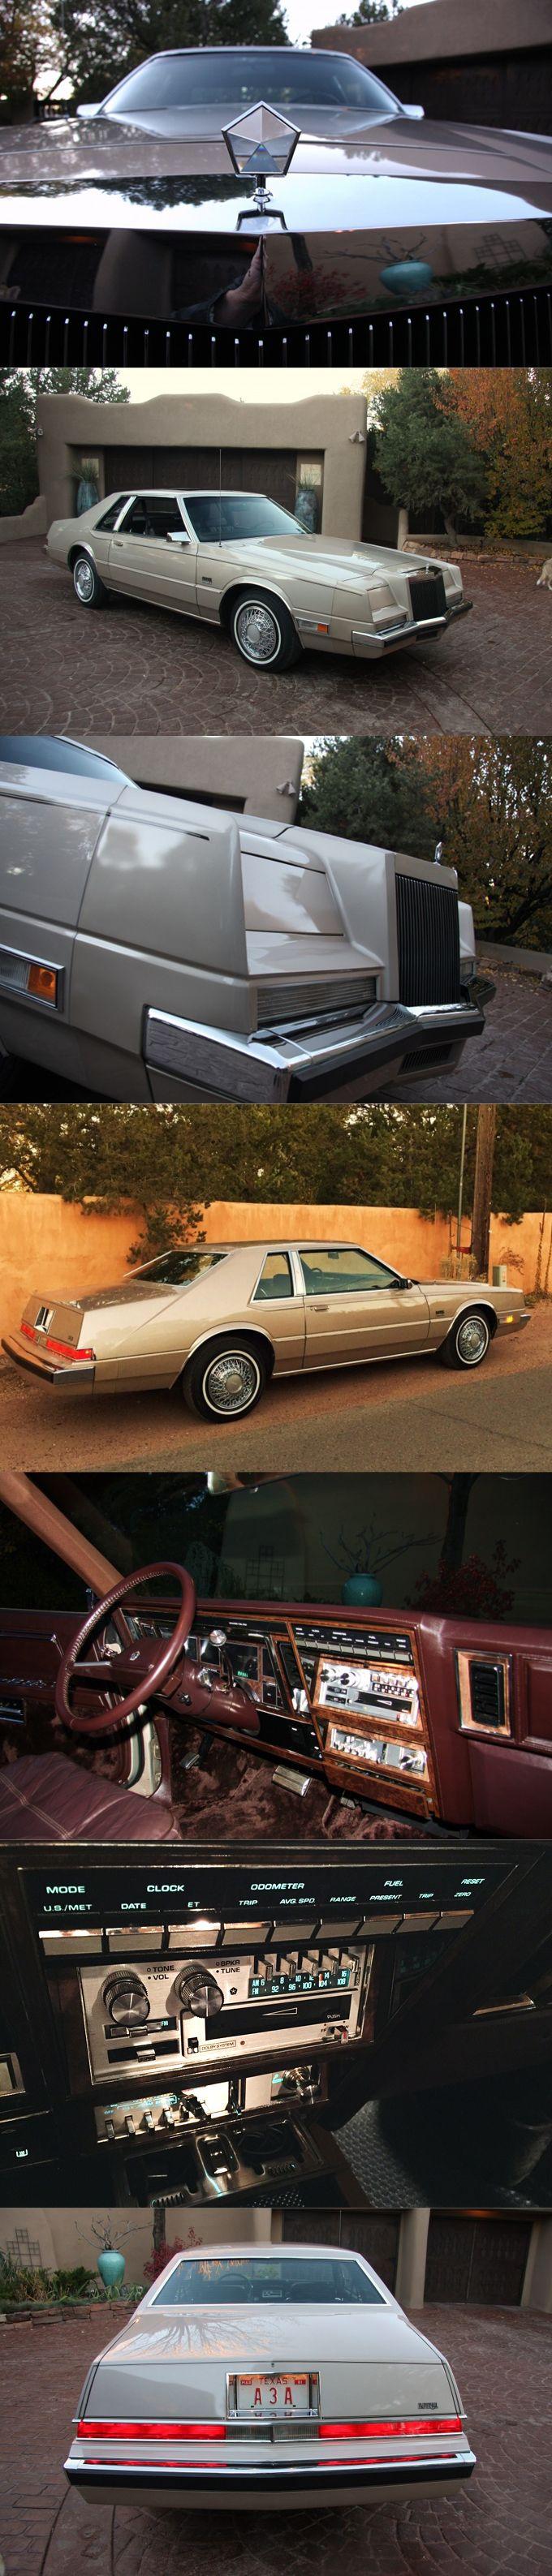 Best 25+ Chrysler imperial ideas on Pinterest | Classic car ...